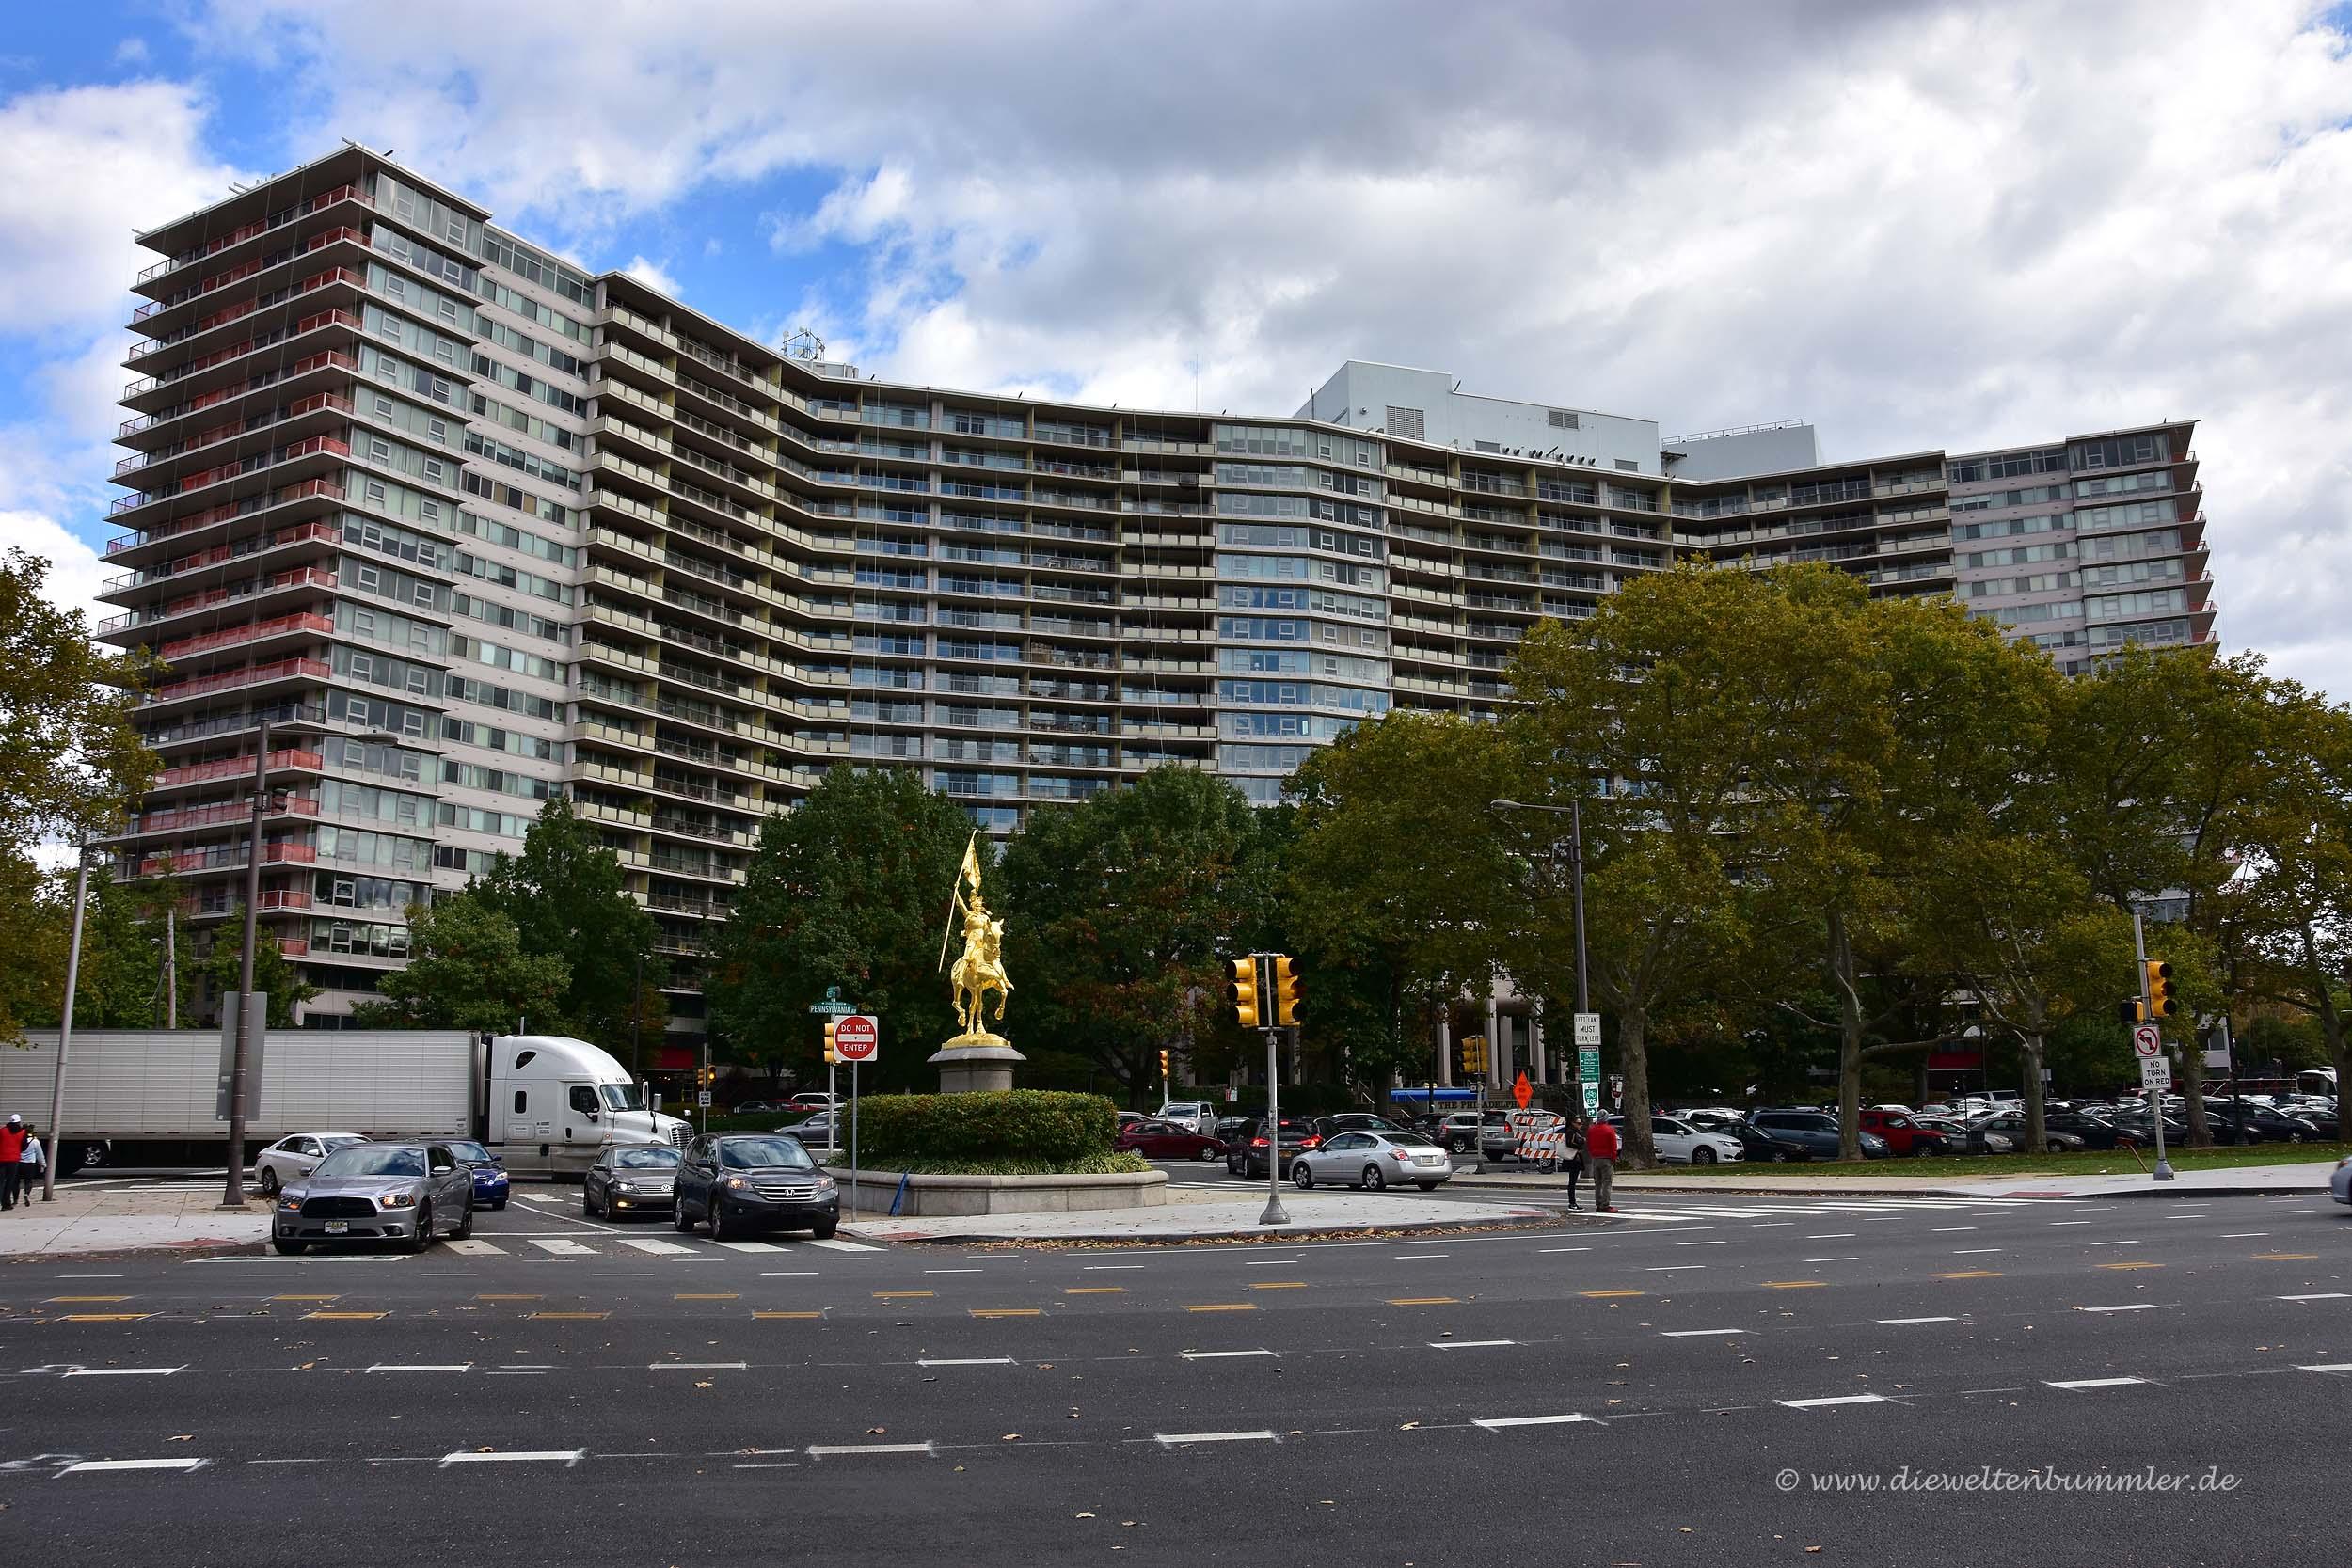 Wohnblock in Philadelphia